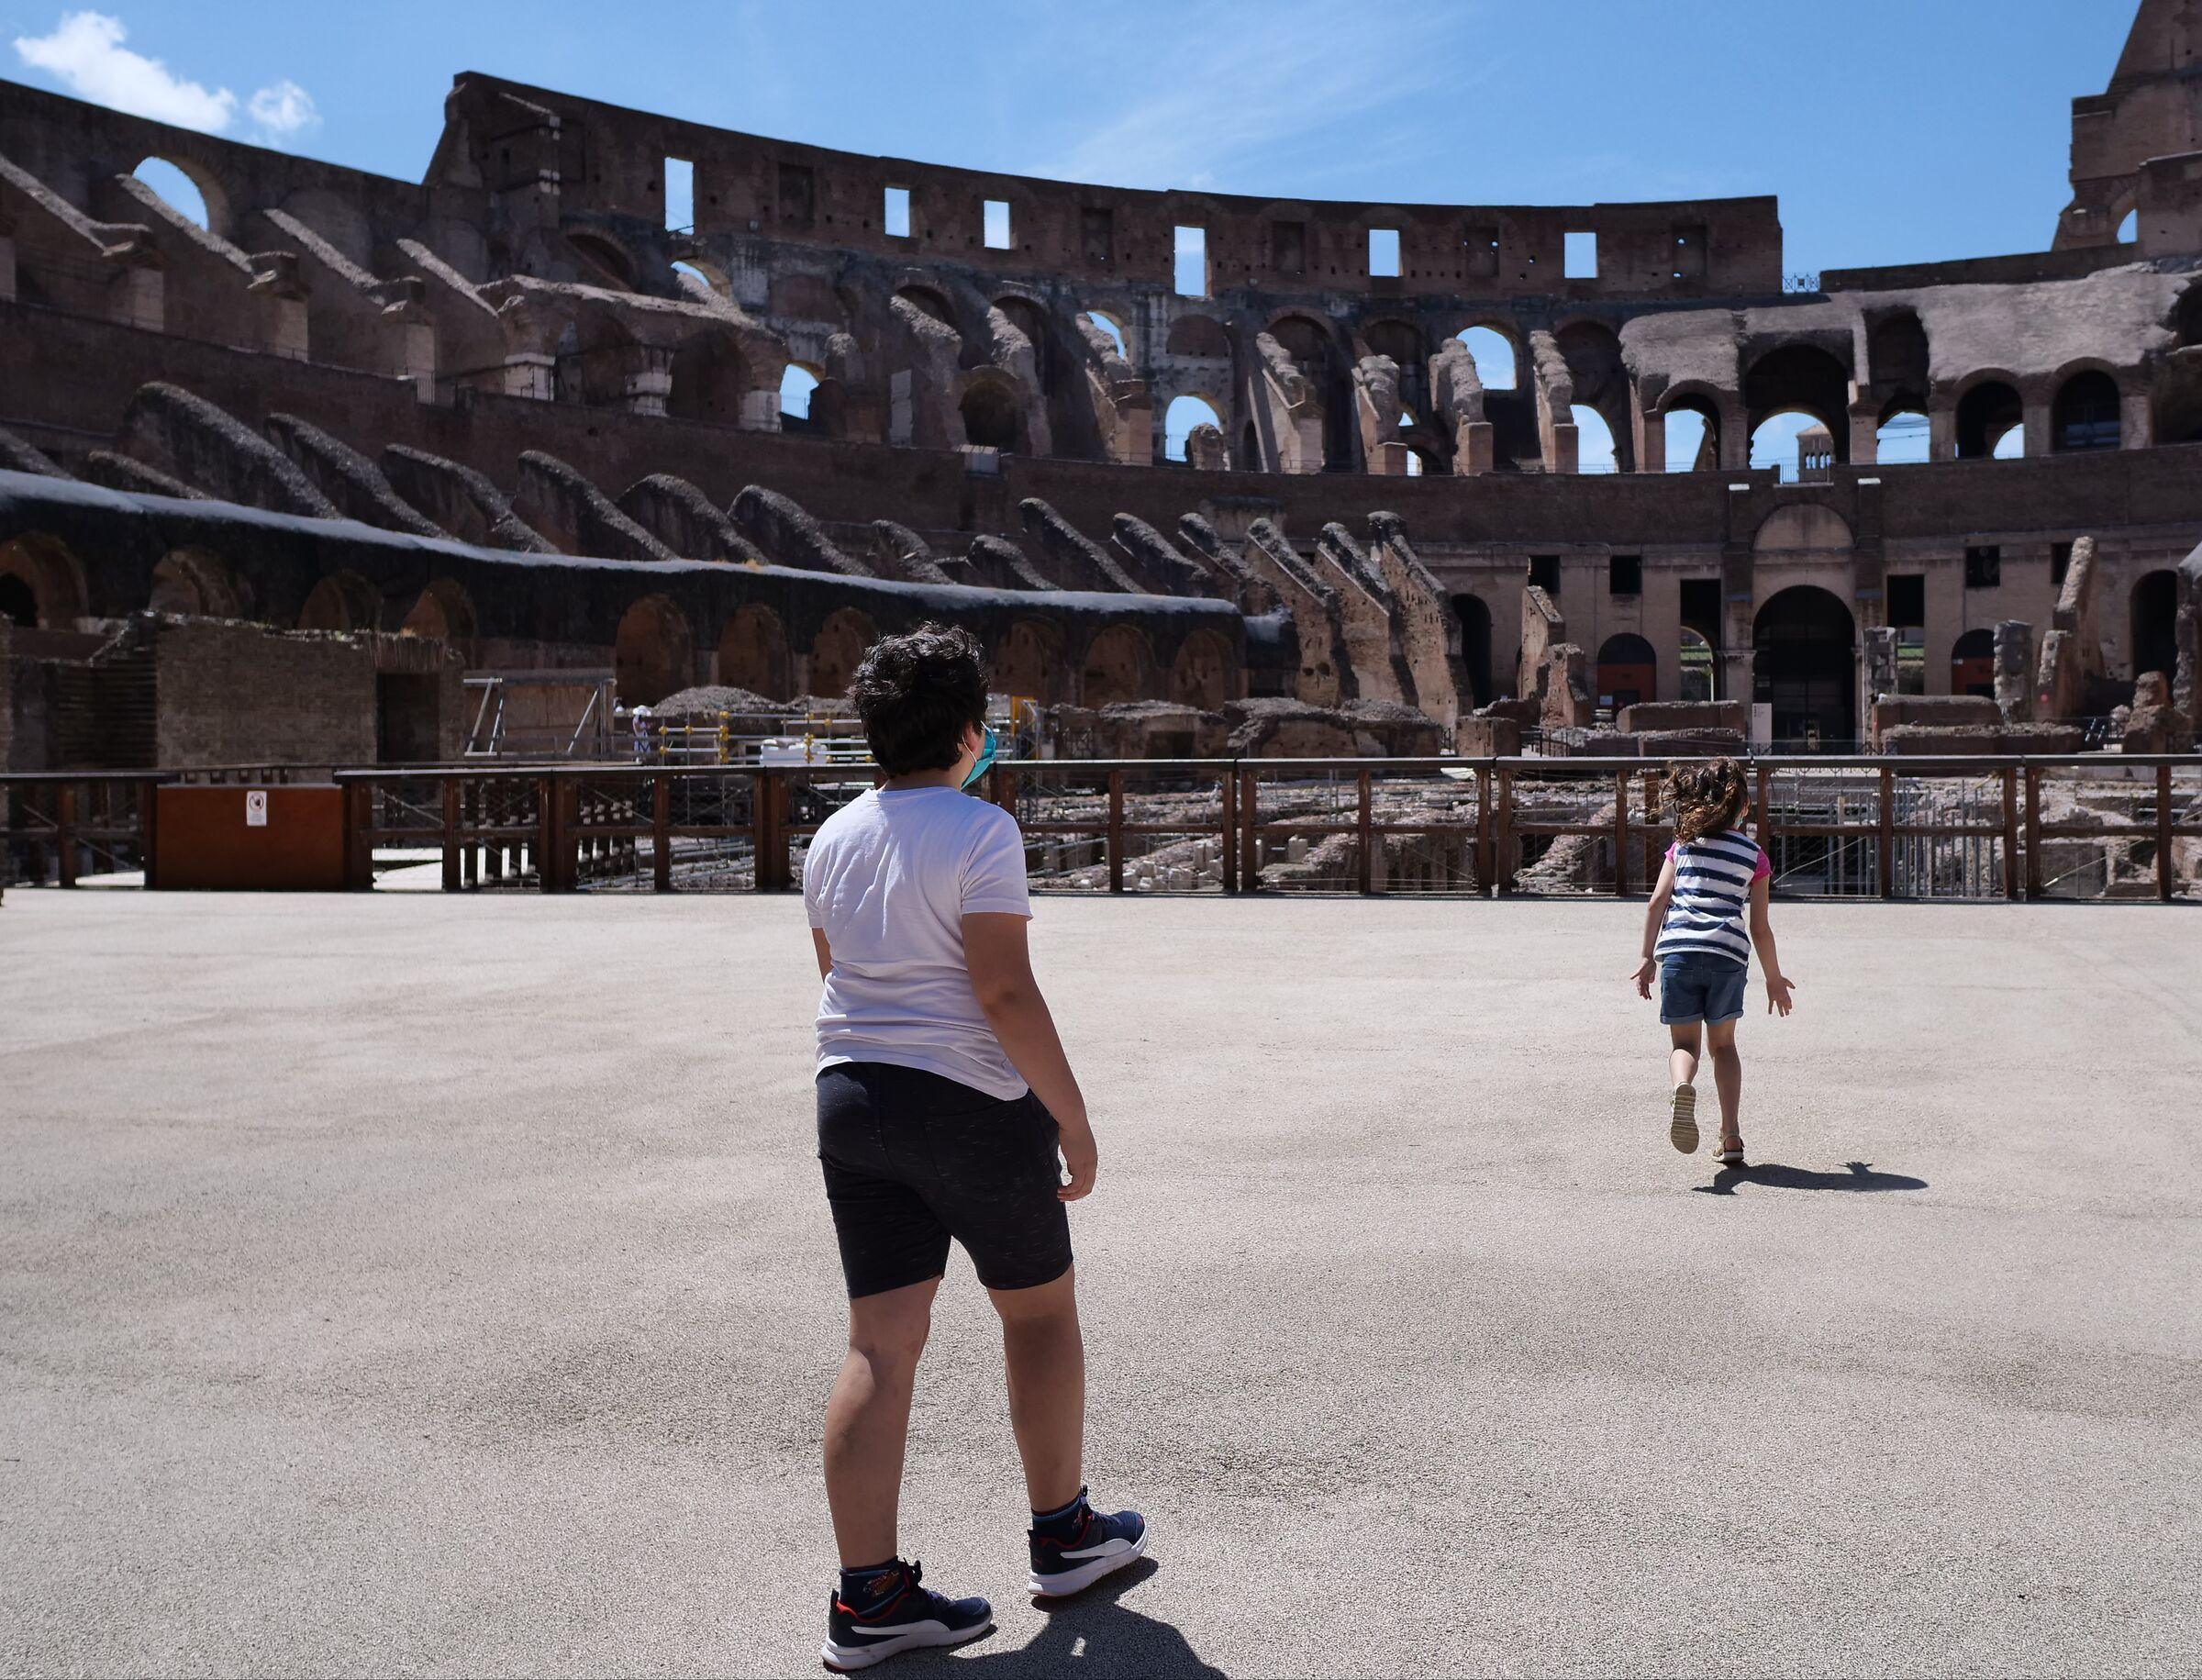 The Return of gladiators...